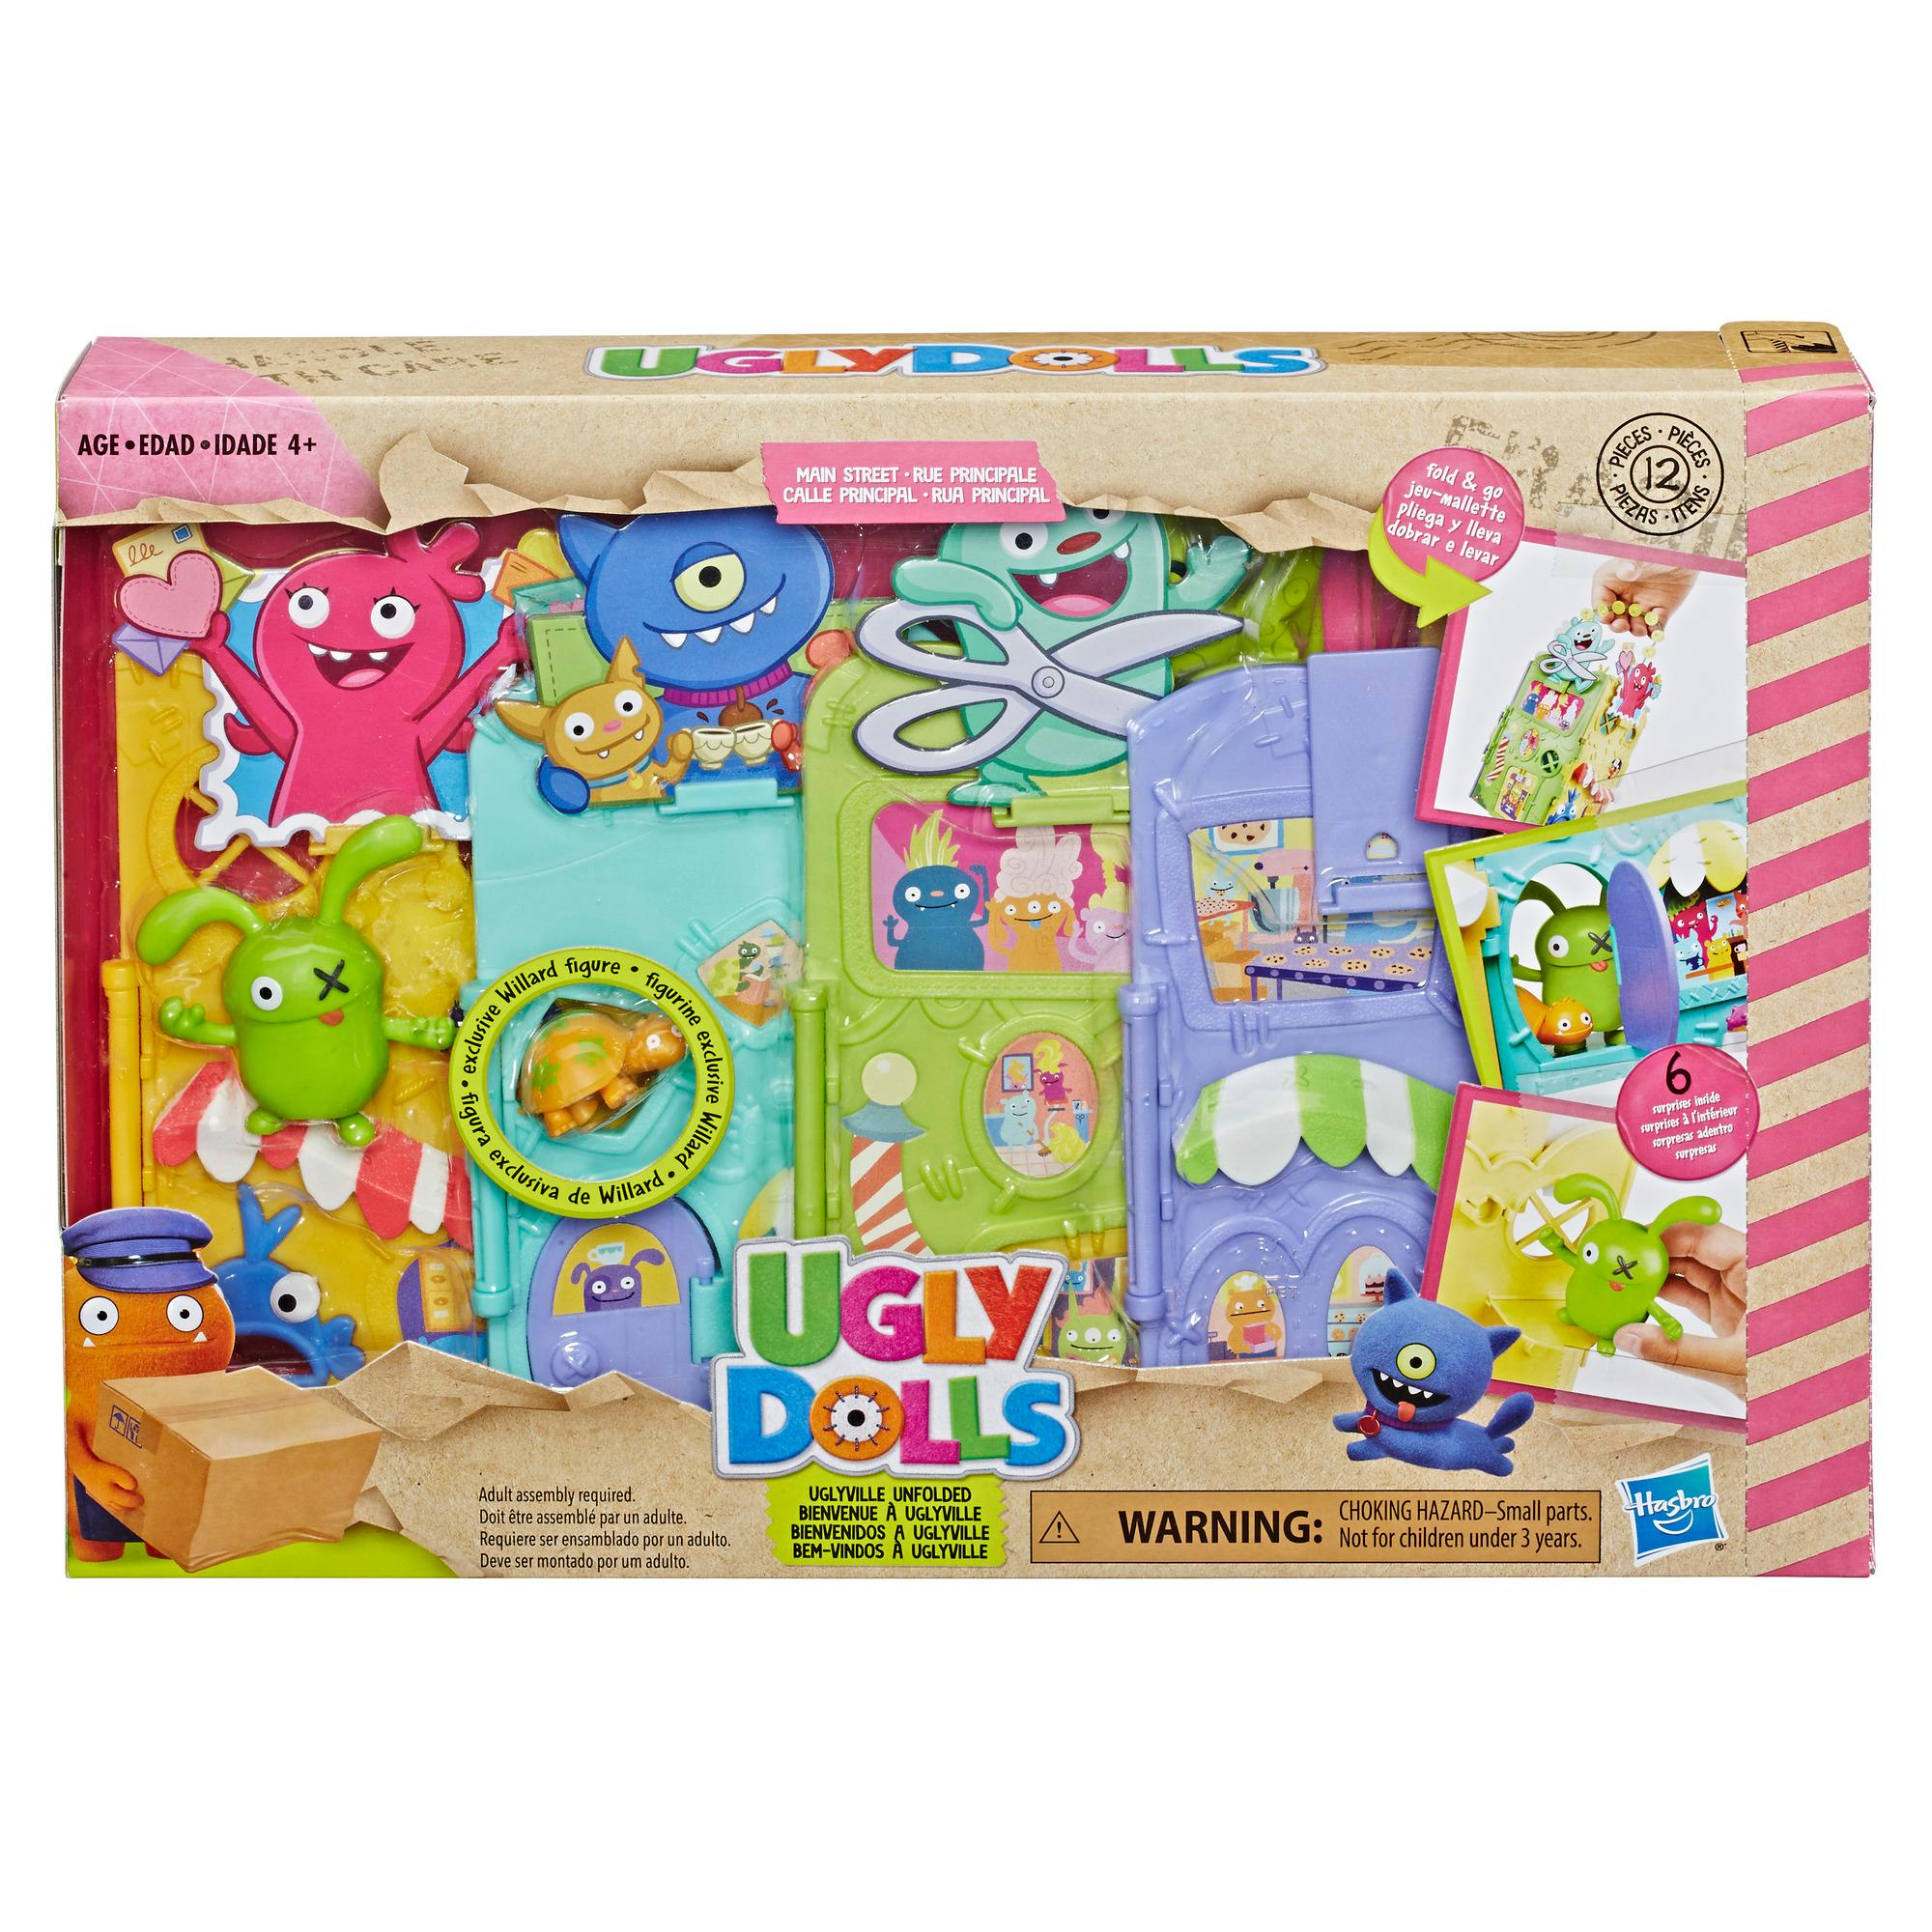 Ugly Dolls Product Thumb 2